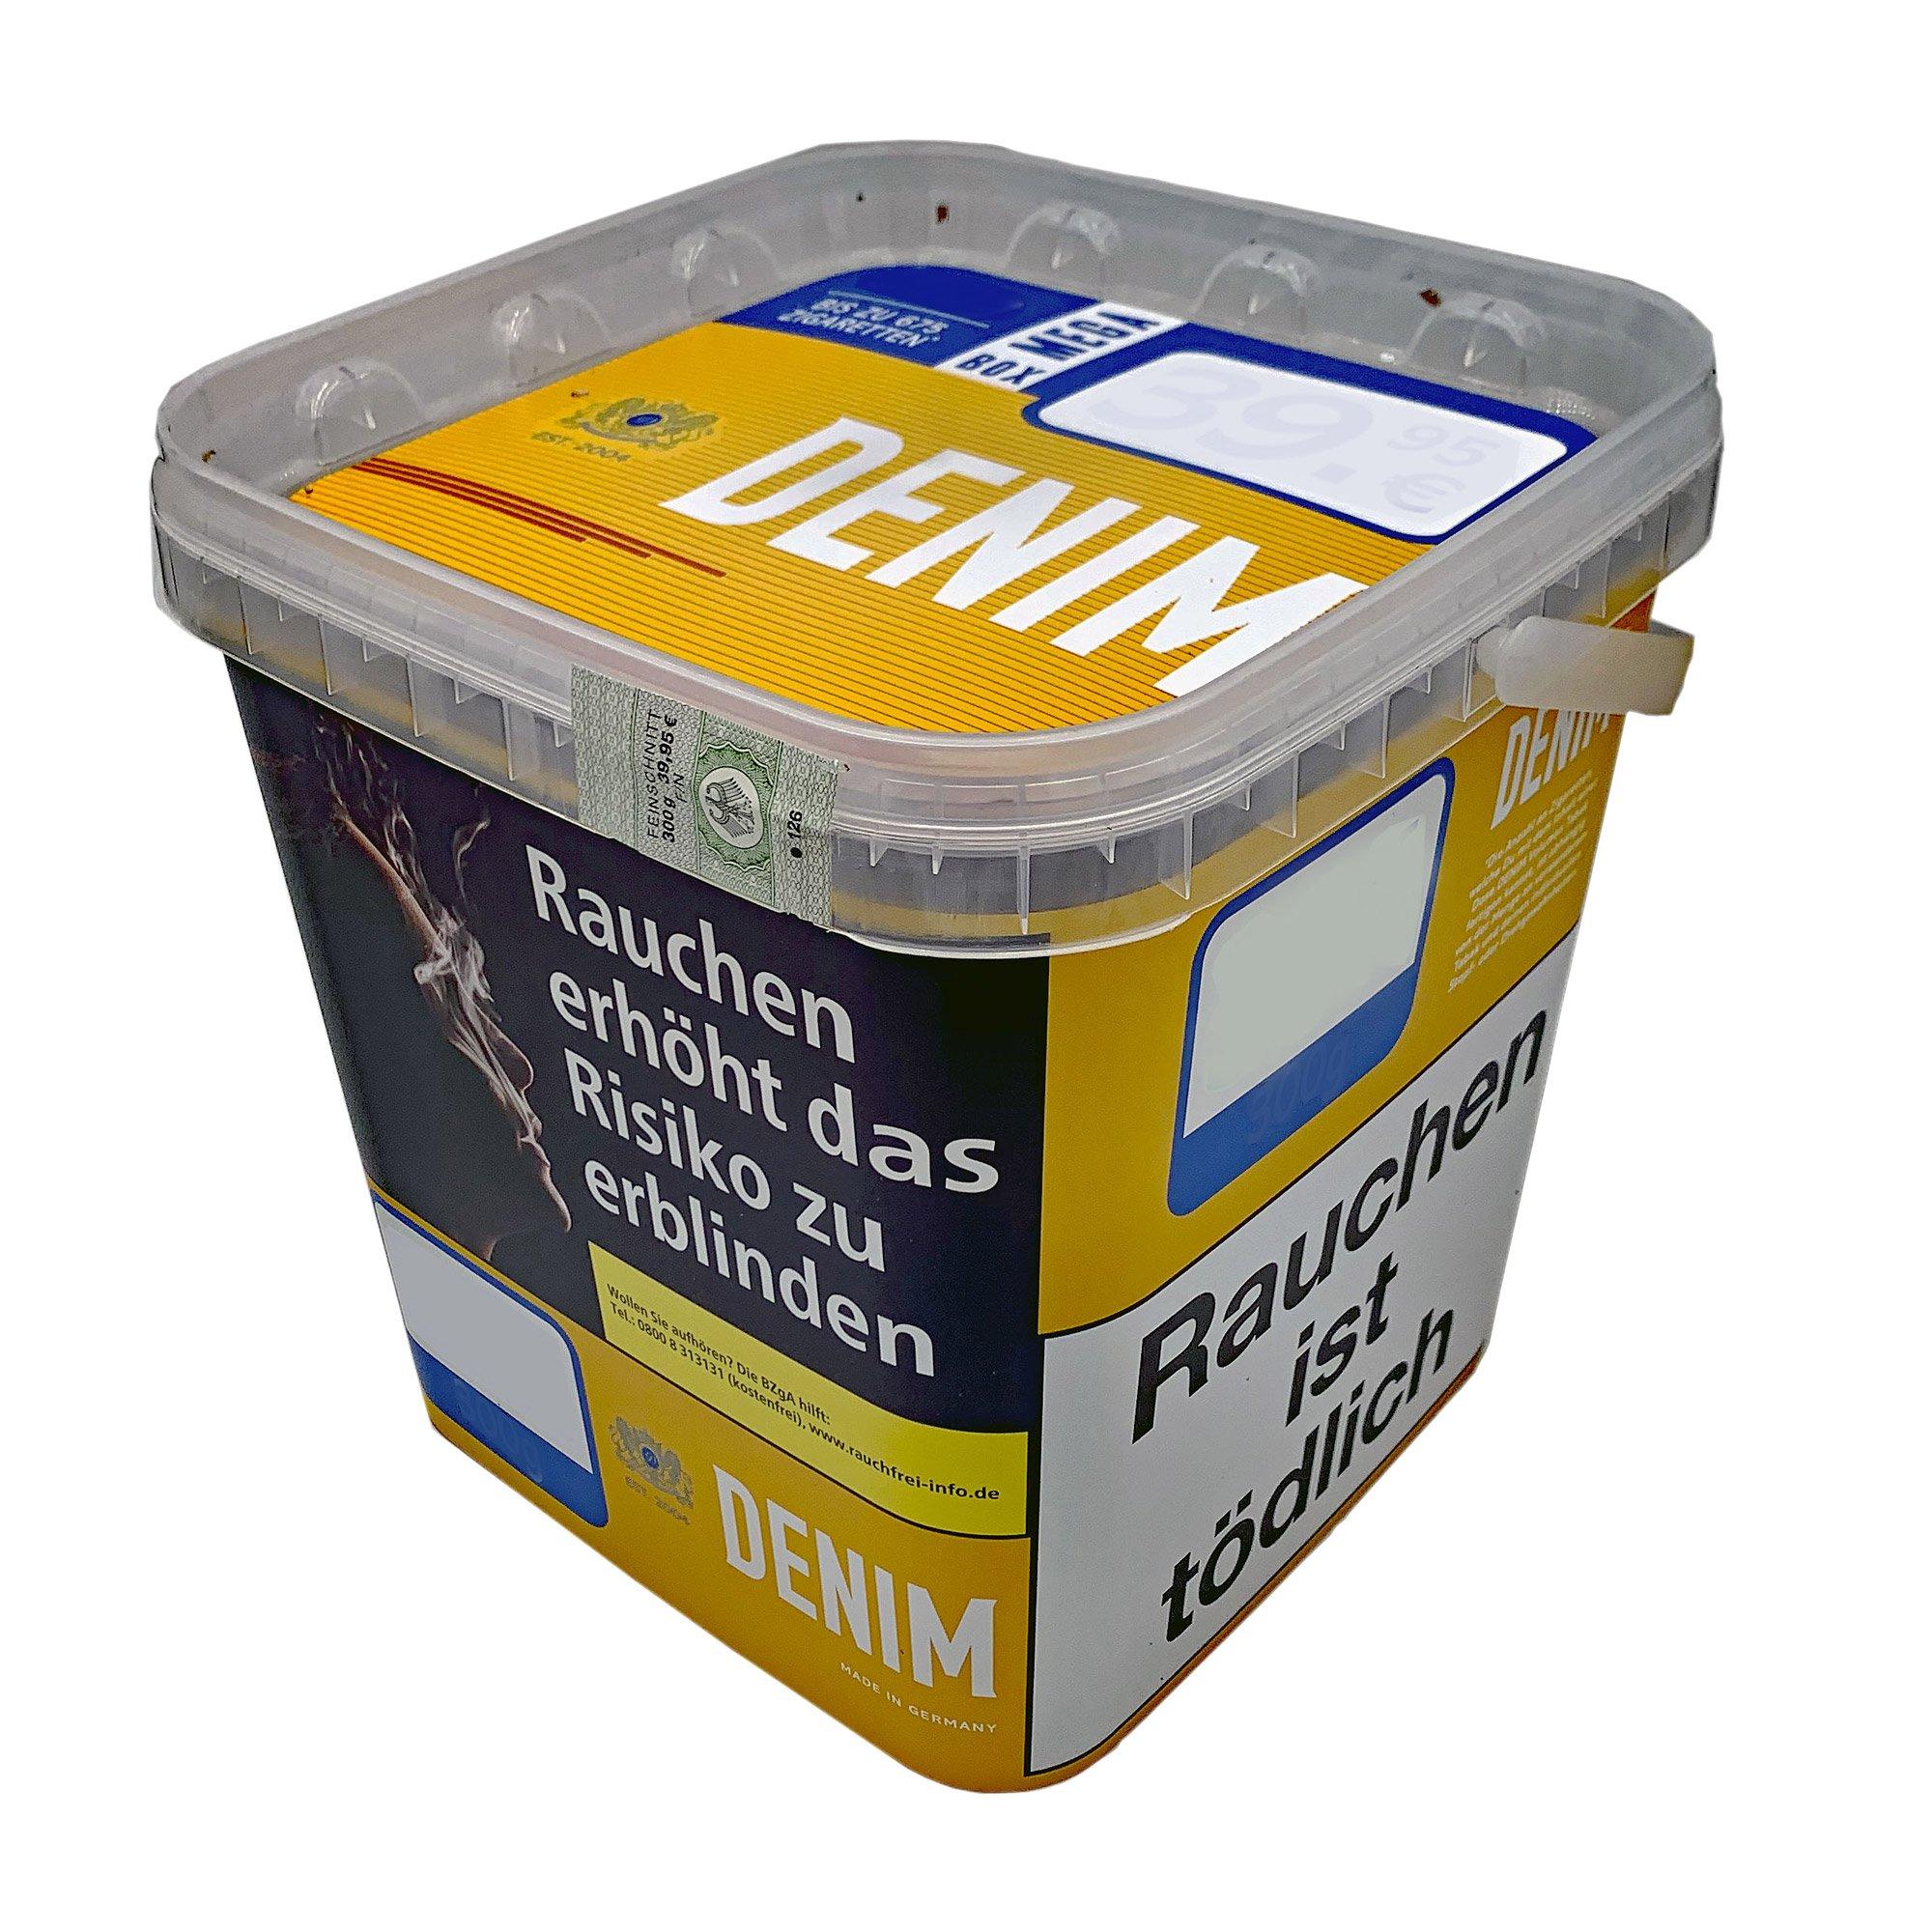 2 x Denim Mega Box Volumentabak 290g Eimer + 1500 Gizeh Extra Hülsen + Zubehör